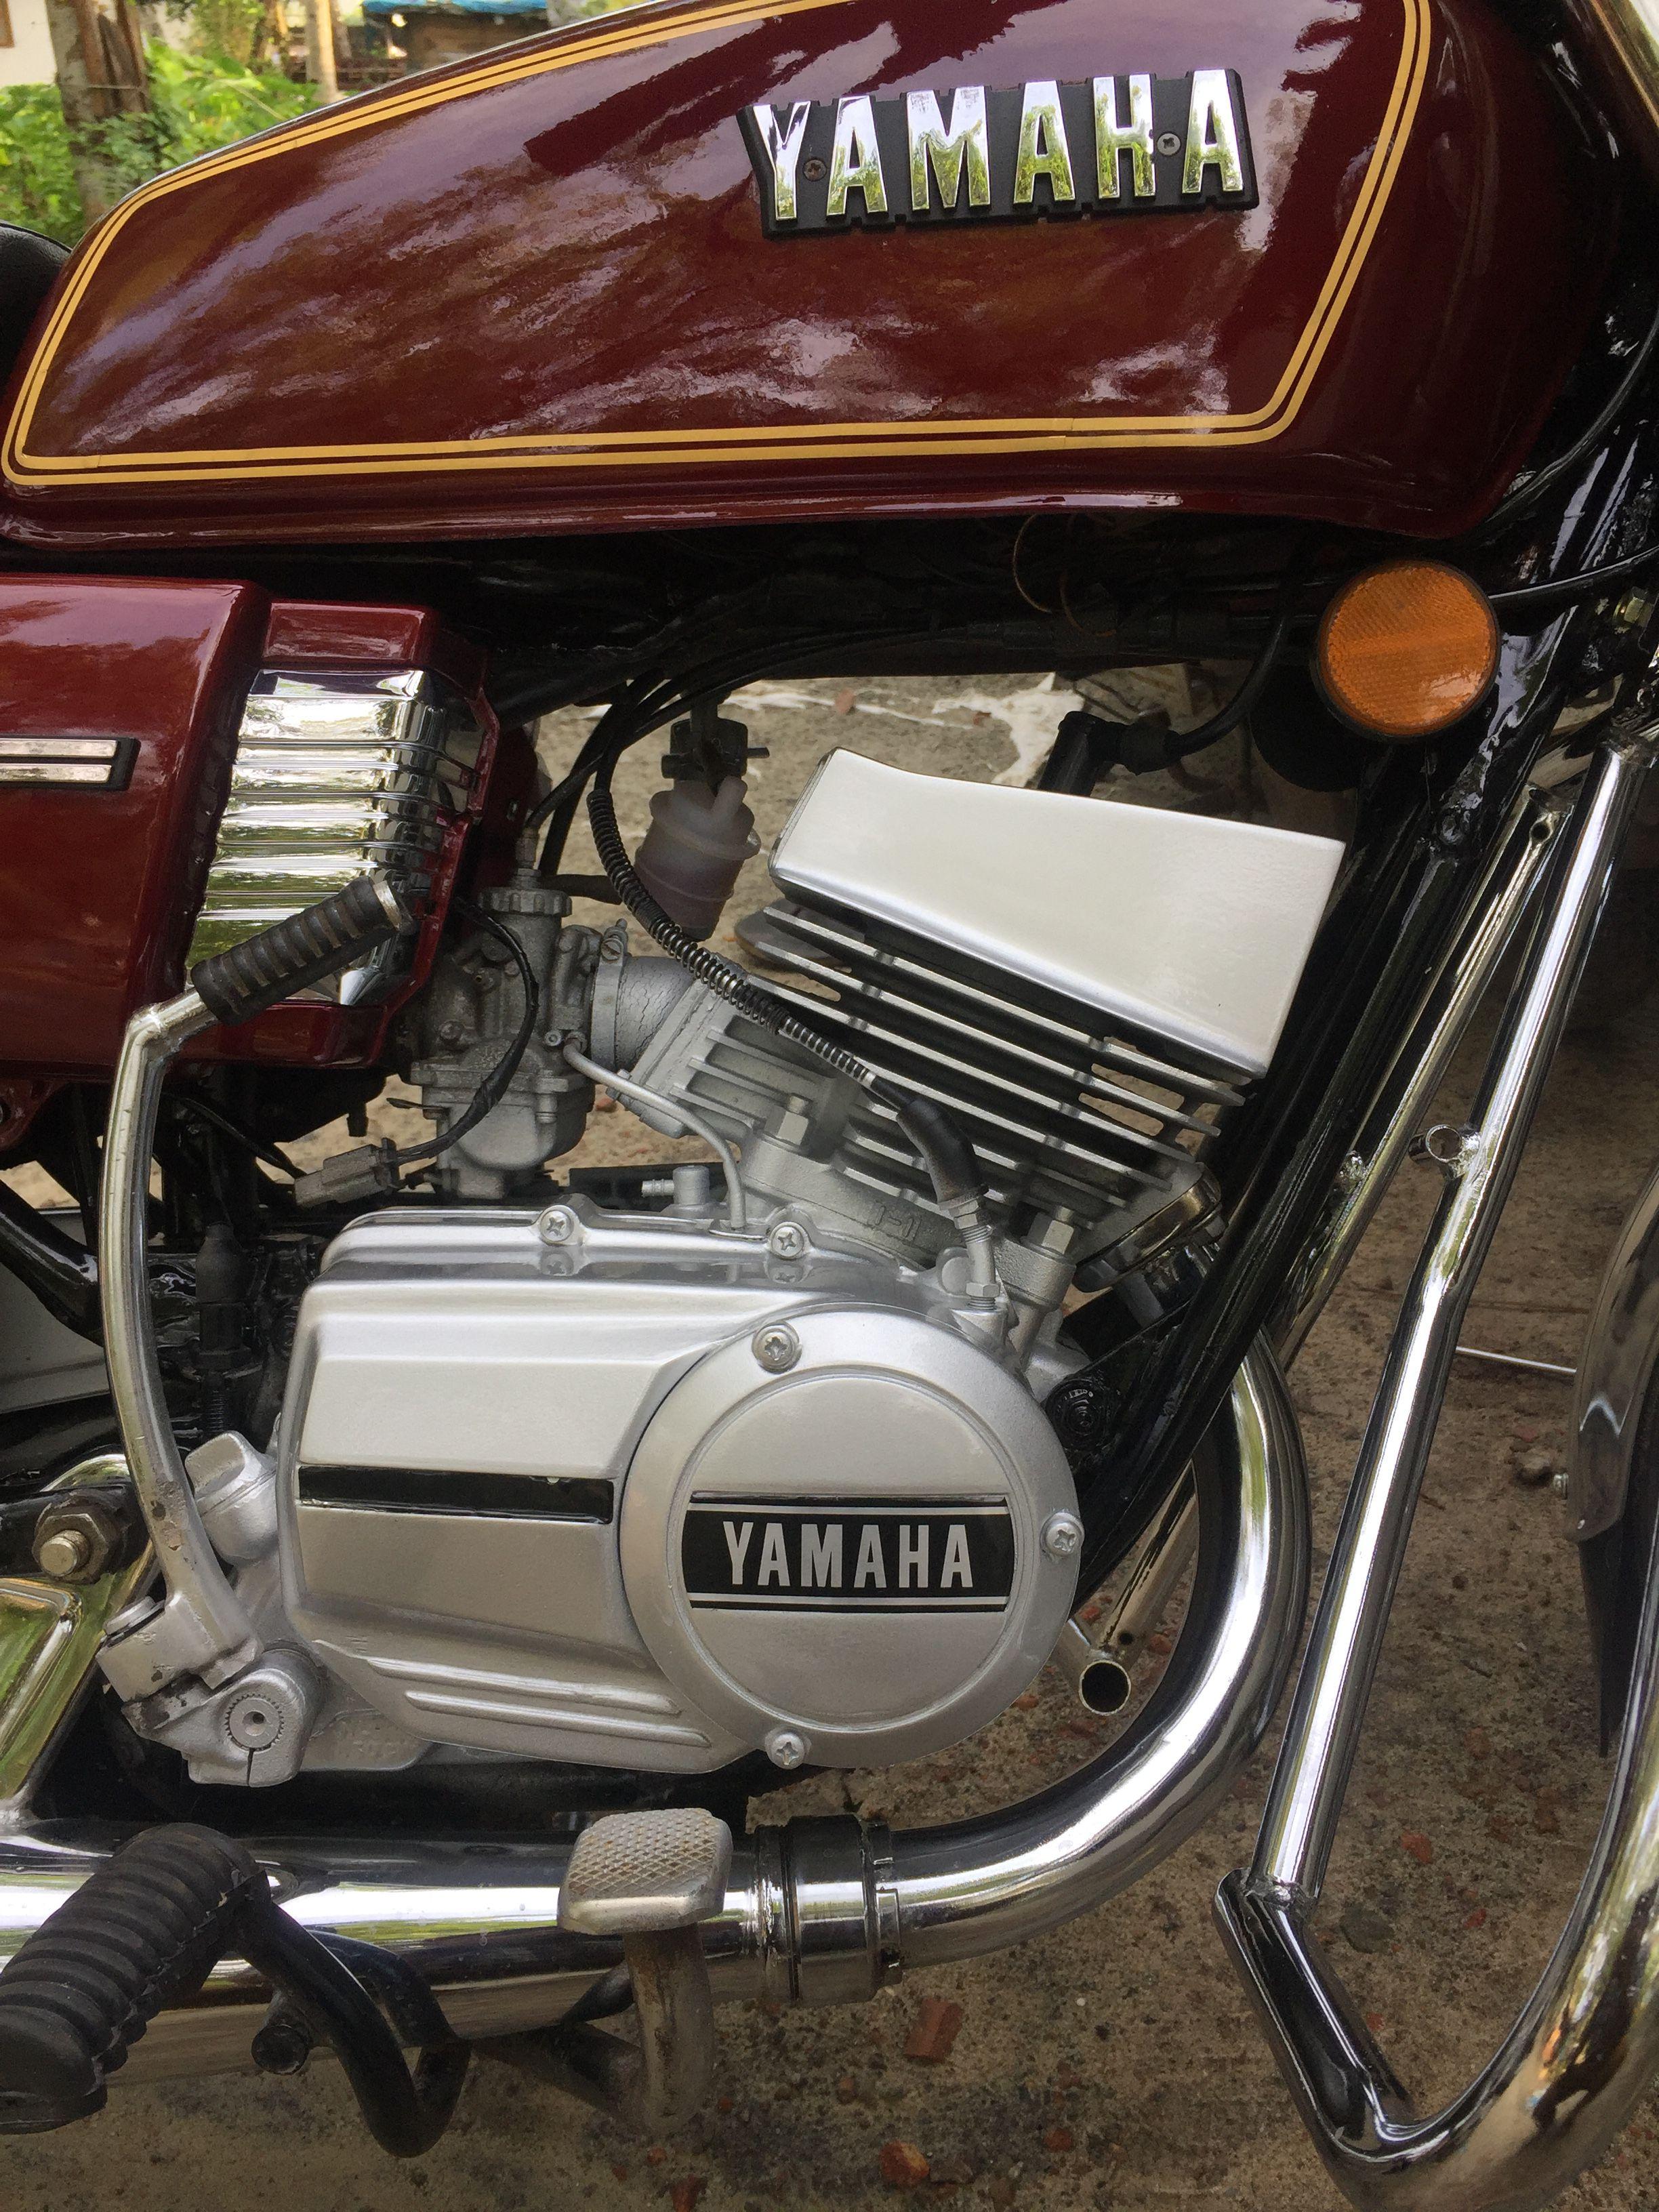 Yamaha Rx100 Engine View Yamaha Rx100 Yamaha Rx 135 Yamaha